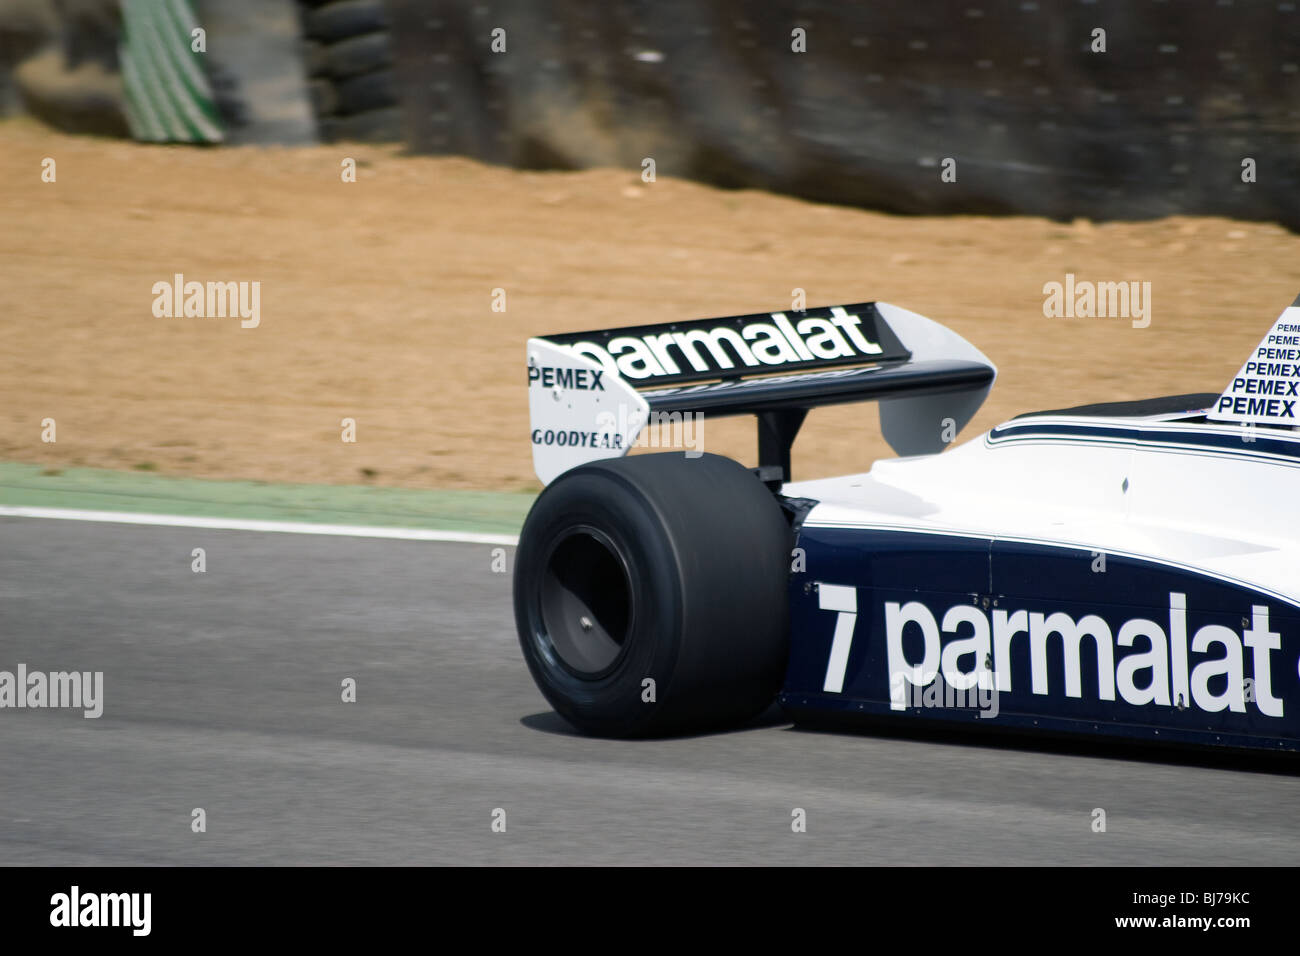 Old Brabham f1 car racing at Brands Hatch Stock Photo: 28435440 - Alamy